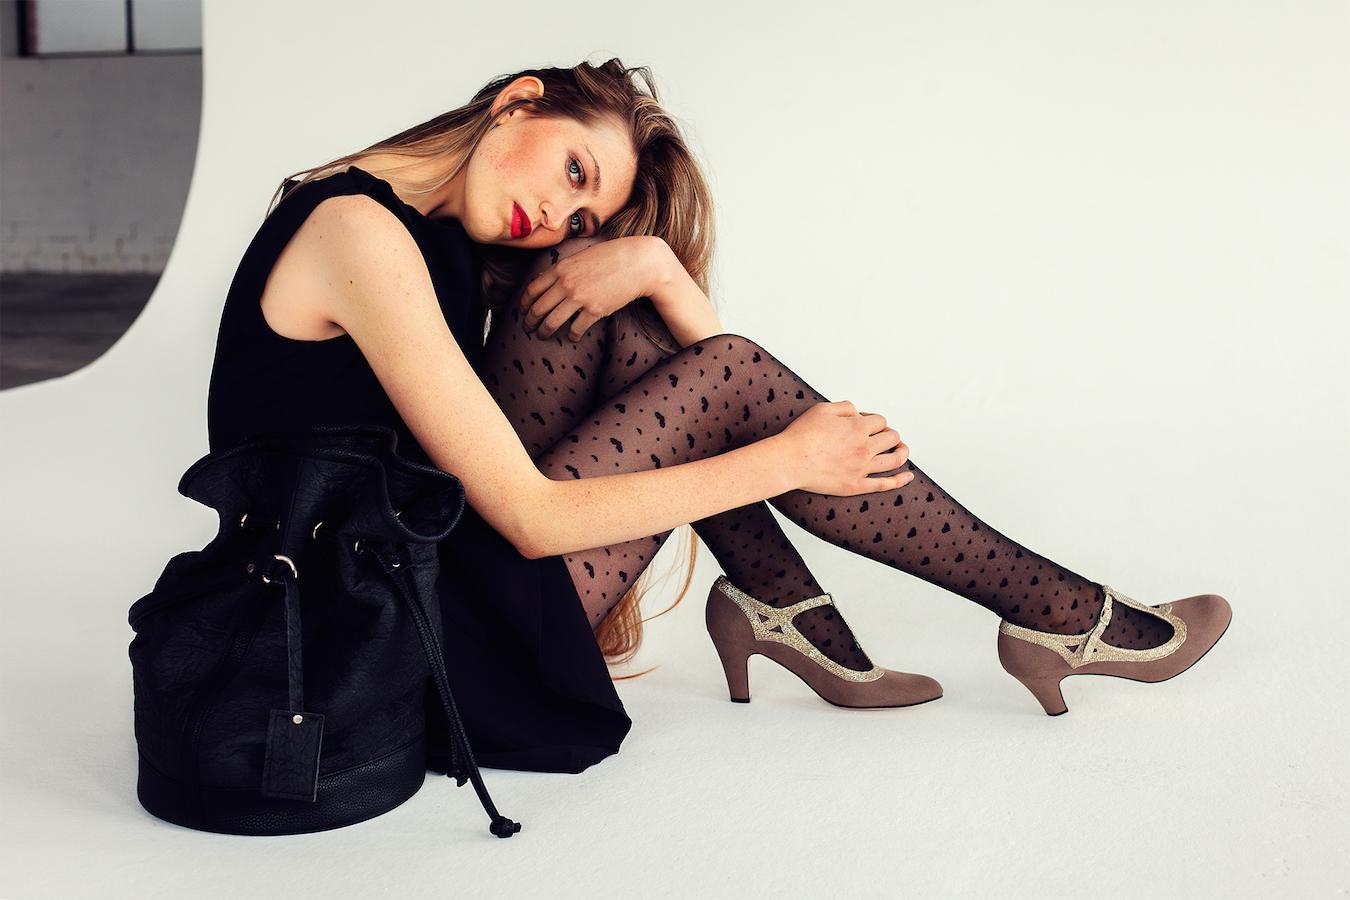 Vegan Models Share Their Thoughts On Vegan Fashion - Vilda Magazine Feature